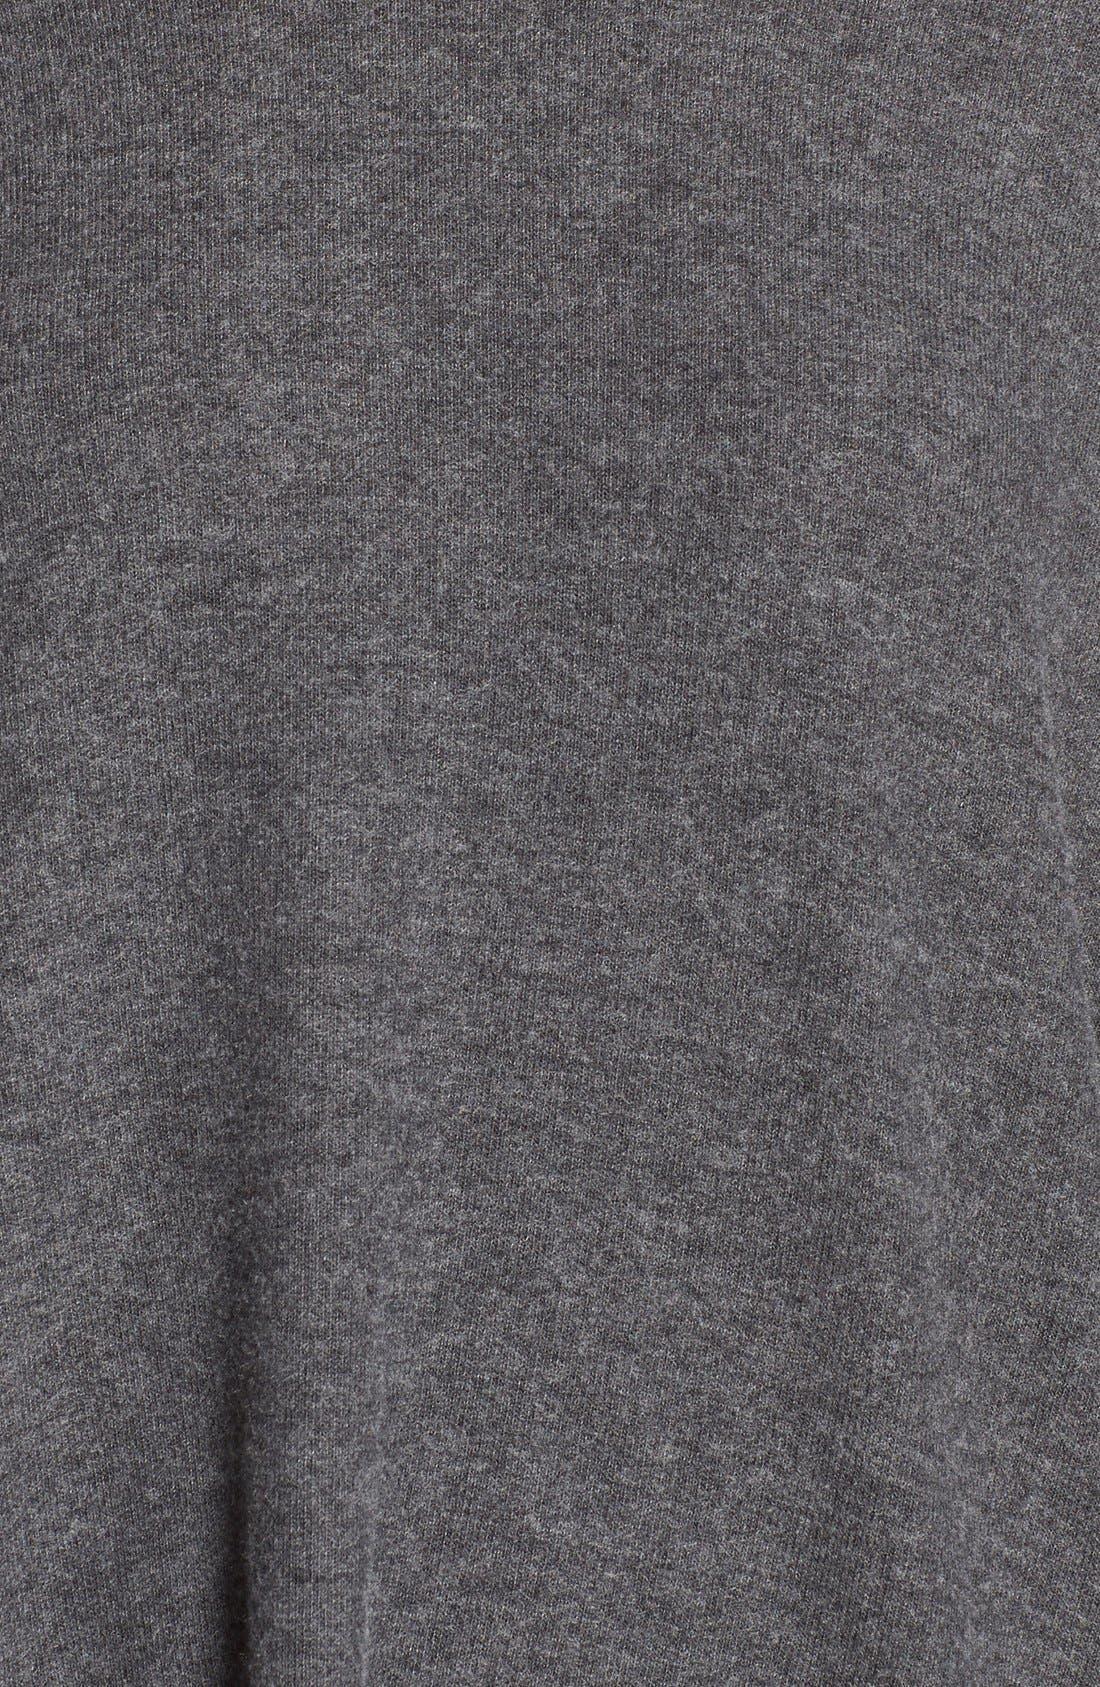 'Dash' Pullover Hoodie,                             Alternate thumbnail 5, color,                             Black